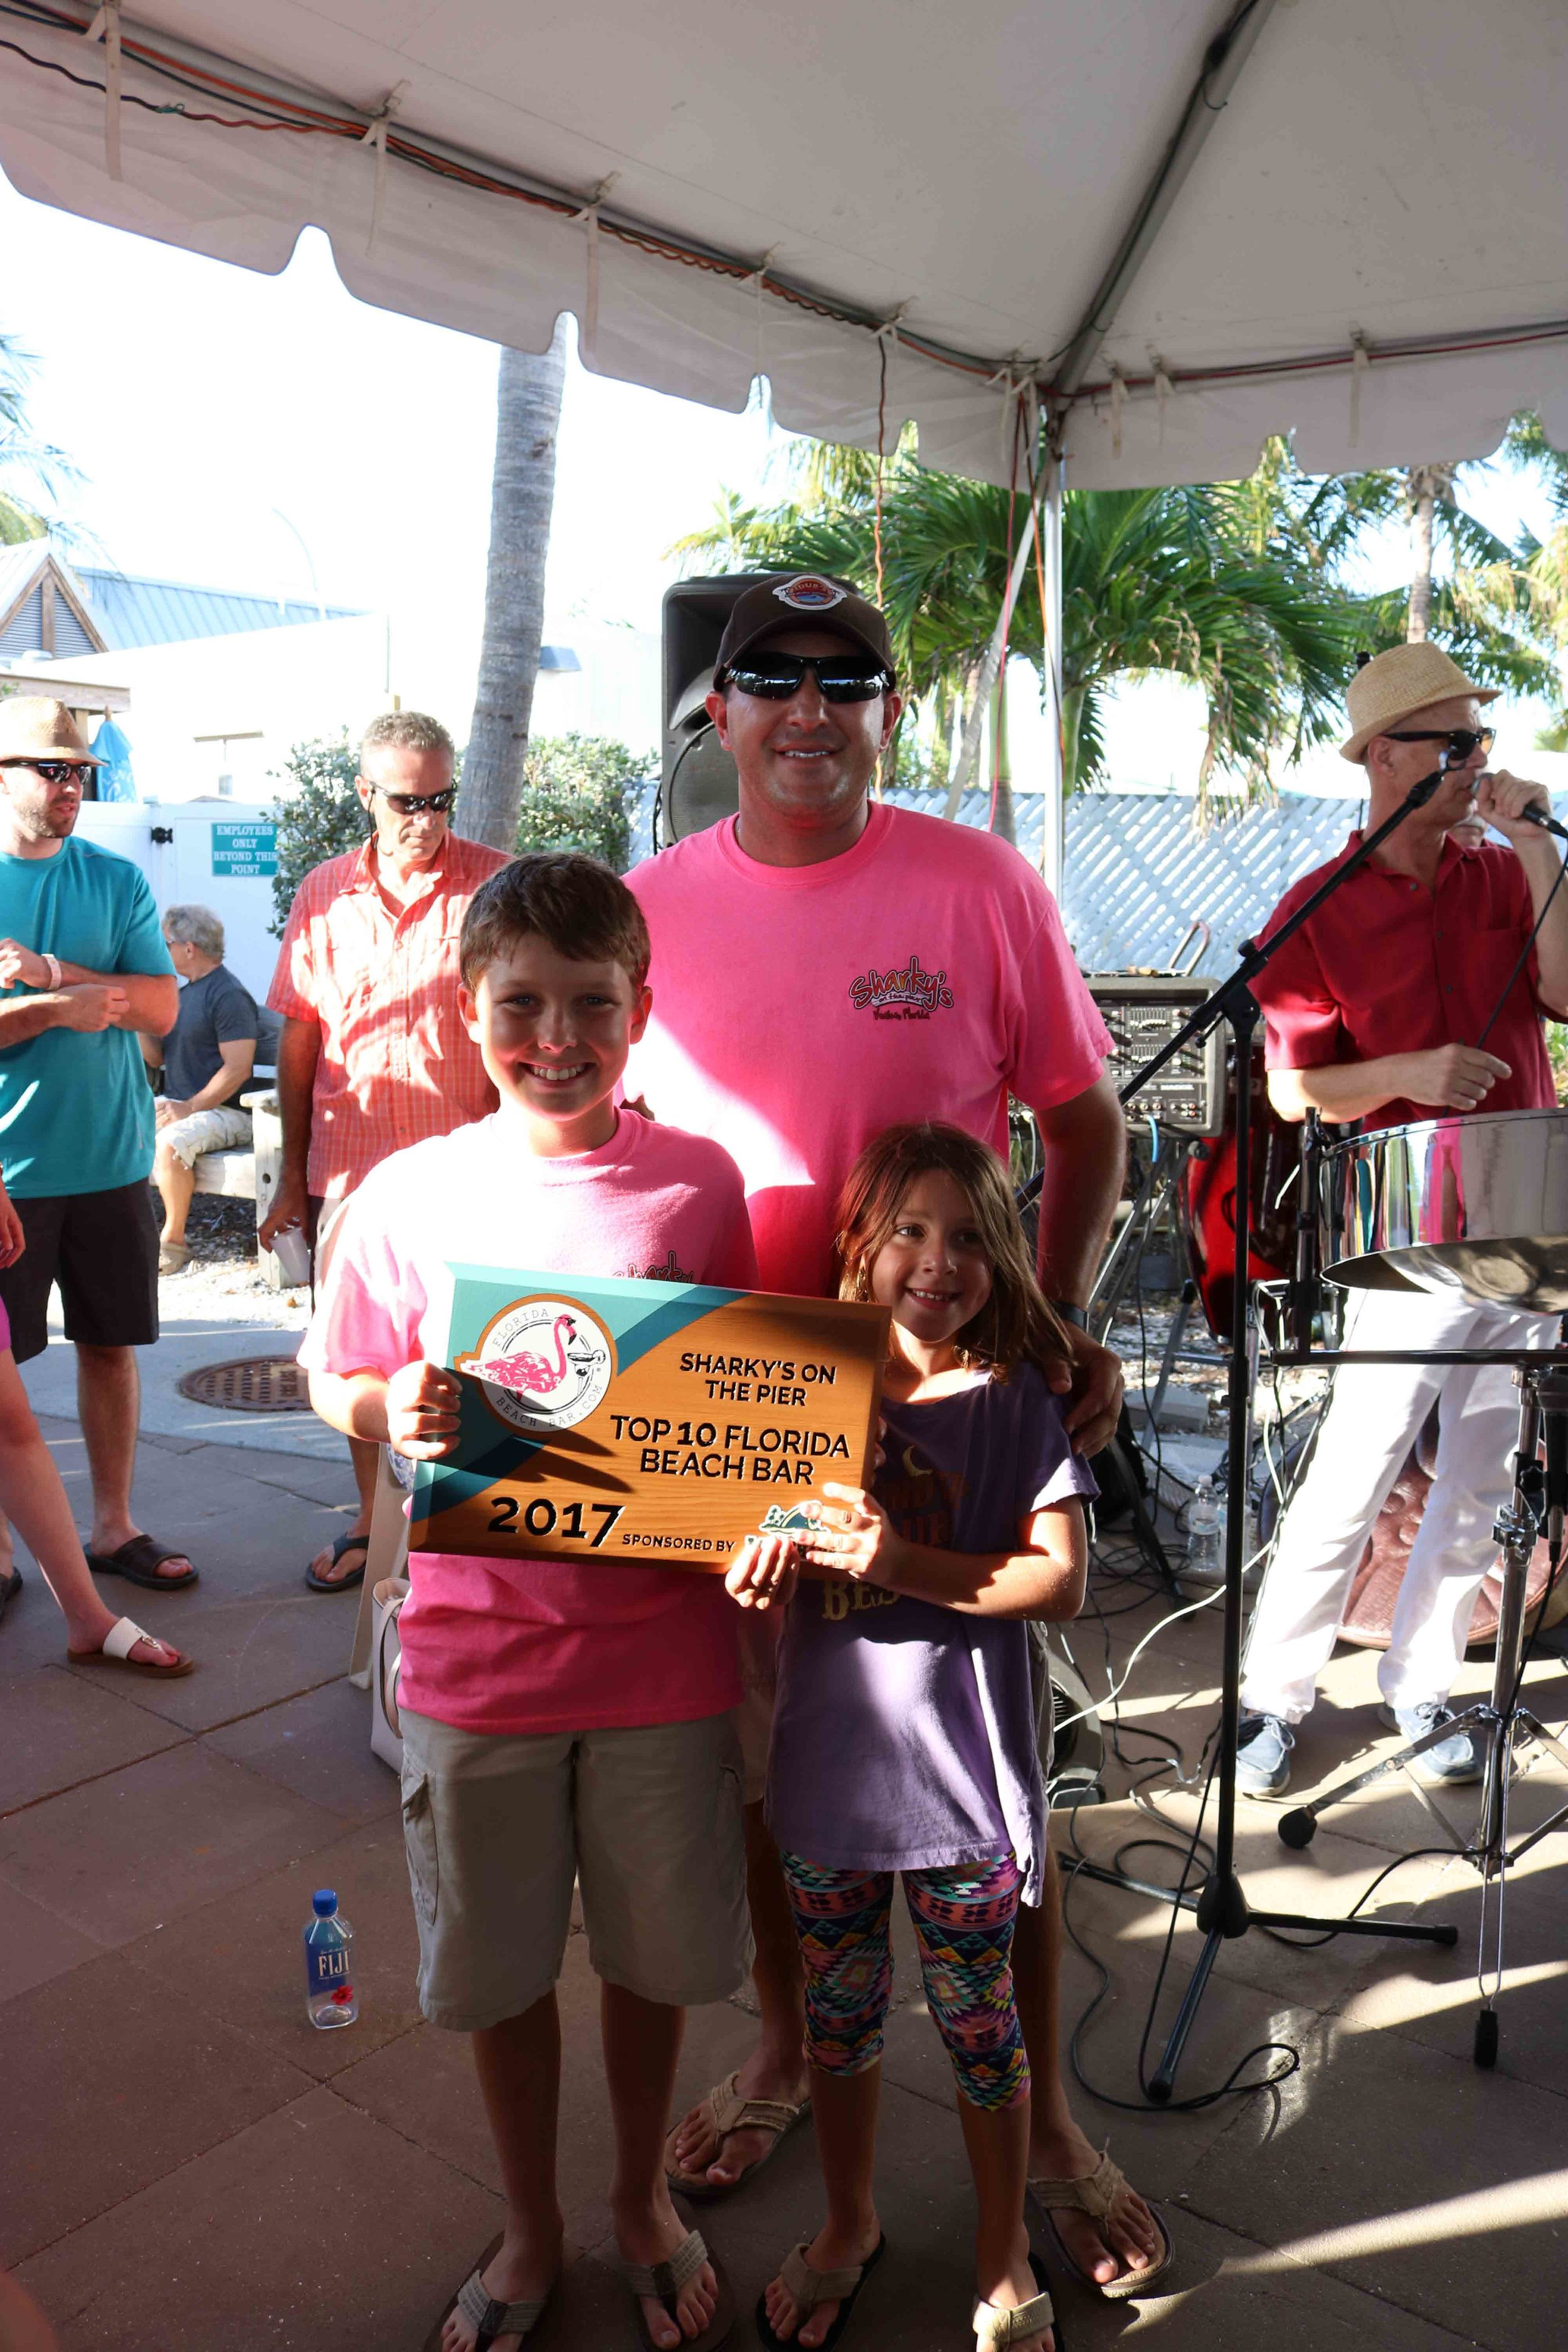 Justin and his family accept the 2017 Top 10 Florida Beach Bar award